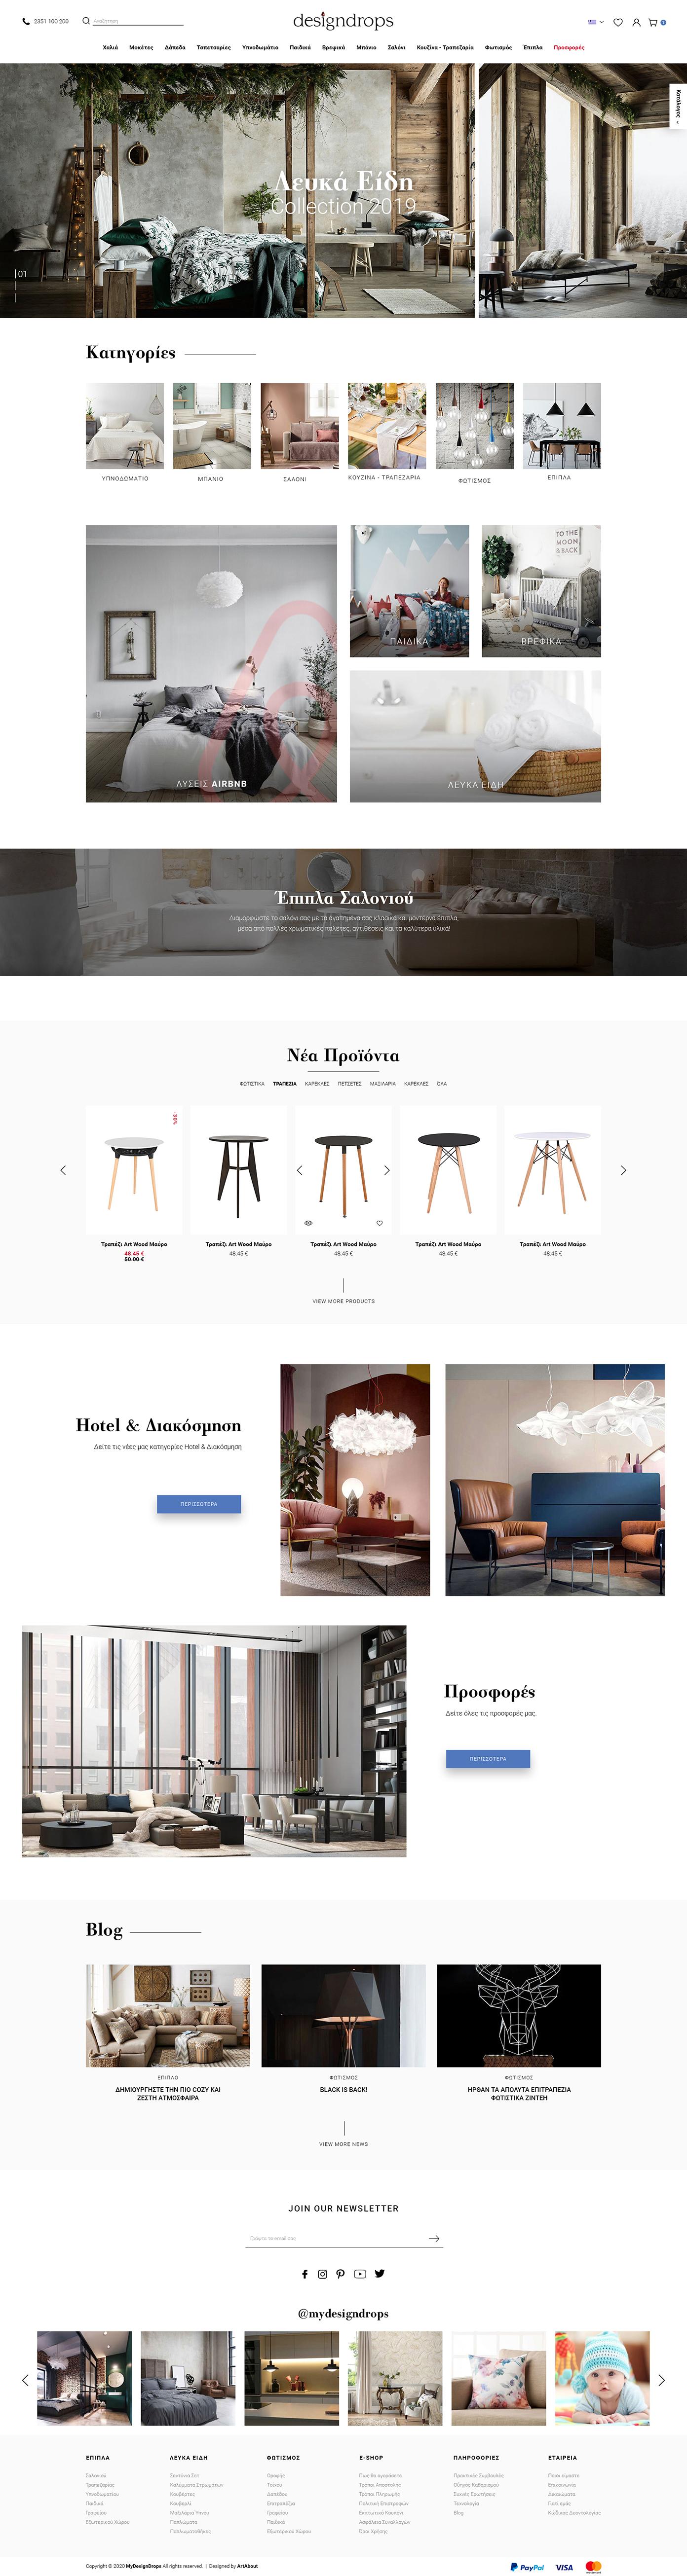 designdrops.com - full Magento2 homepage